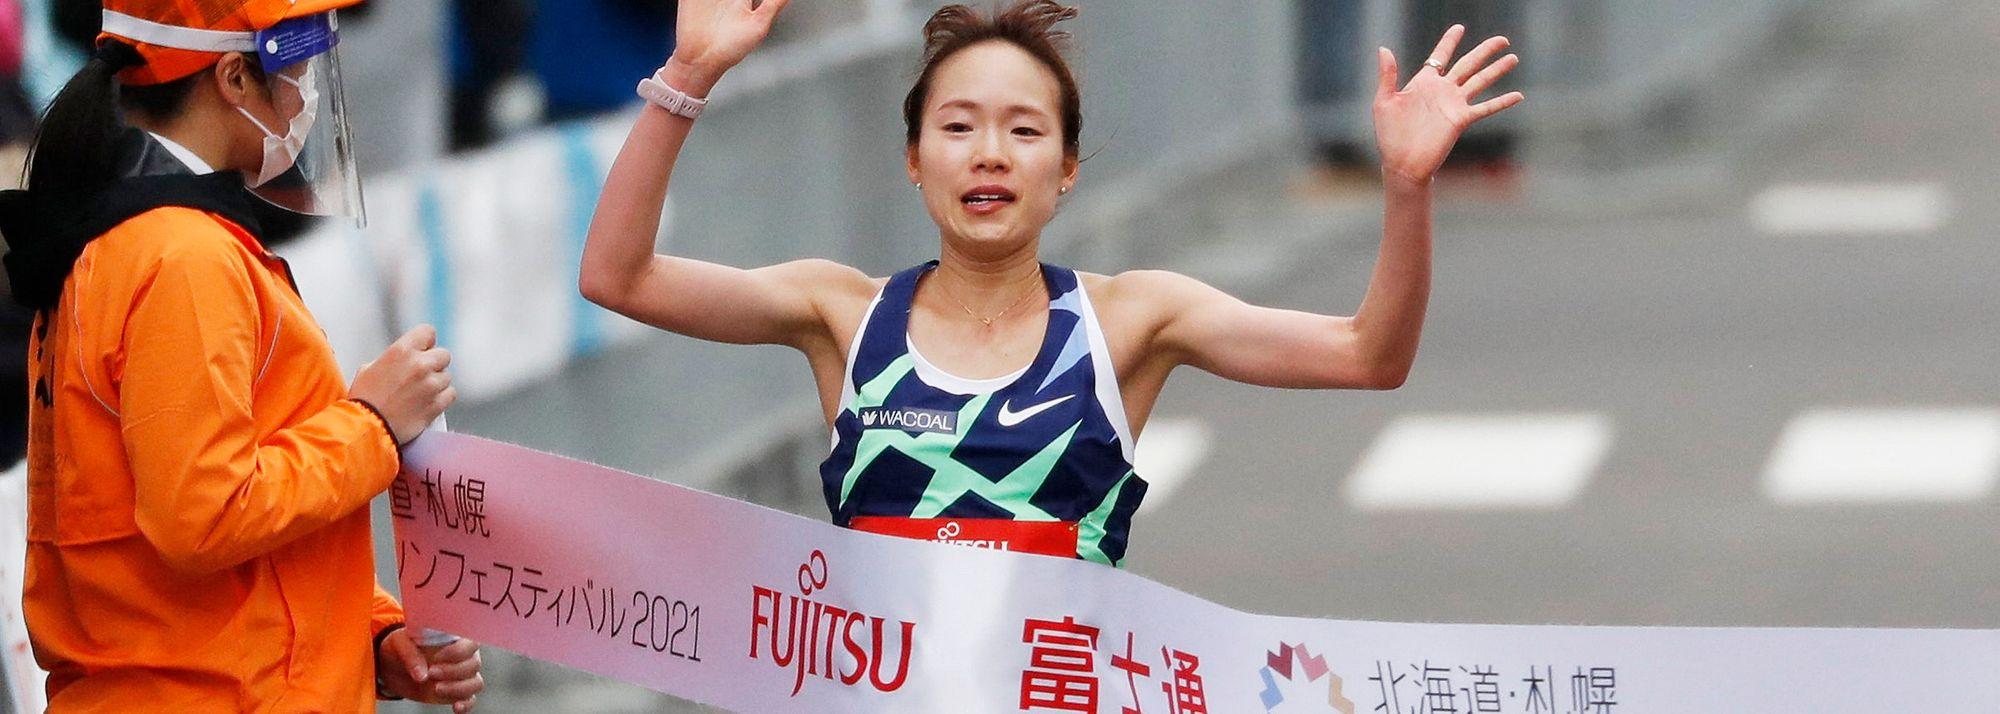 Japan's Mao Ichiyama clocks 1:08:28, Kenya's Hillary Kipkoech runs 1:00:46